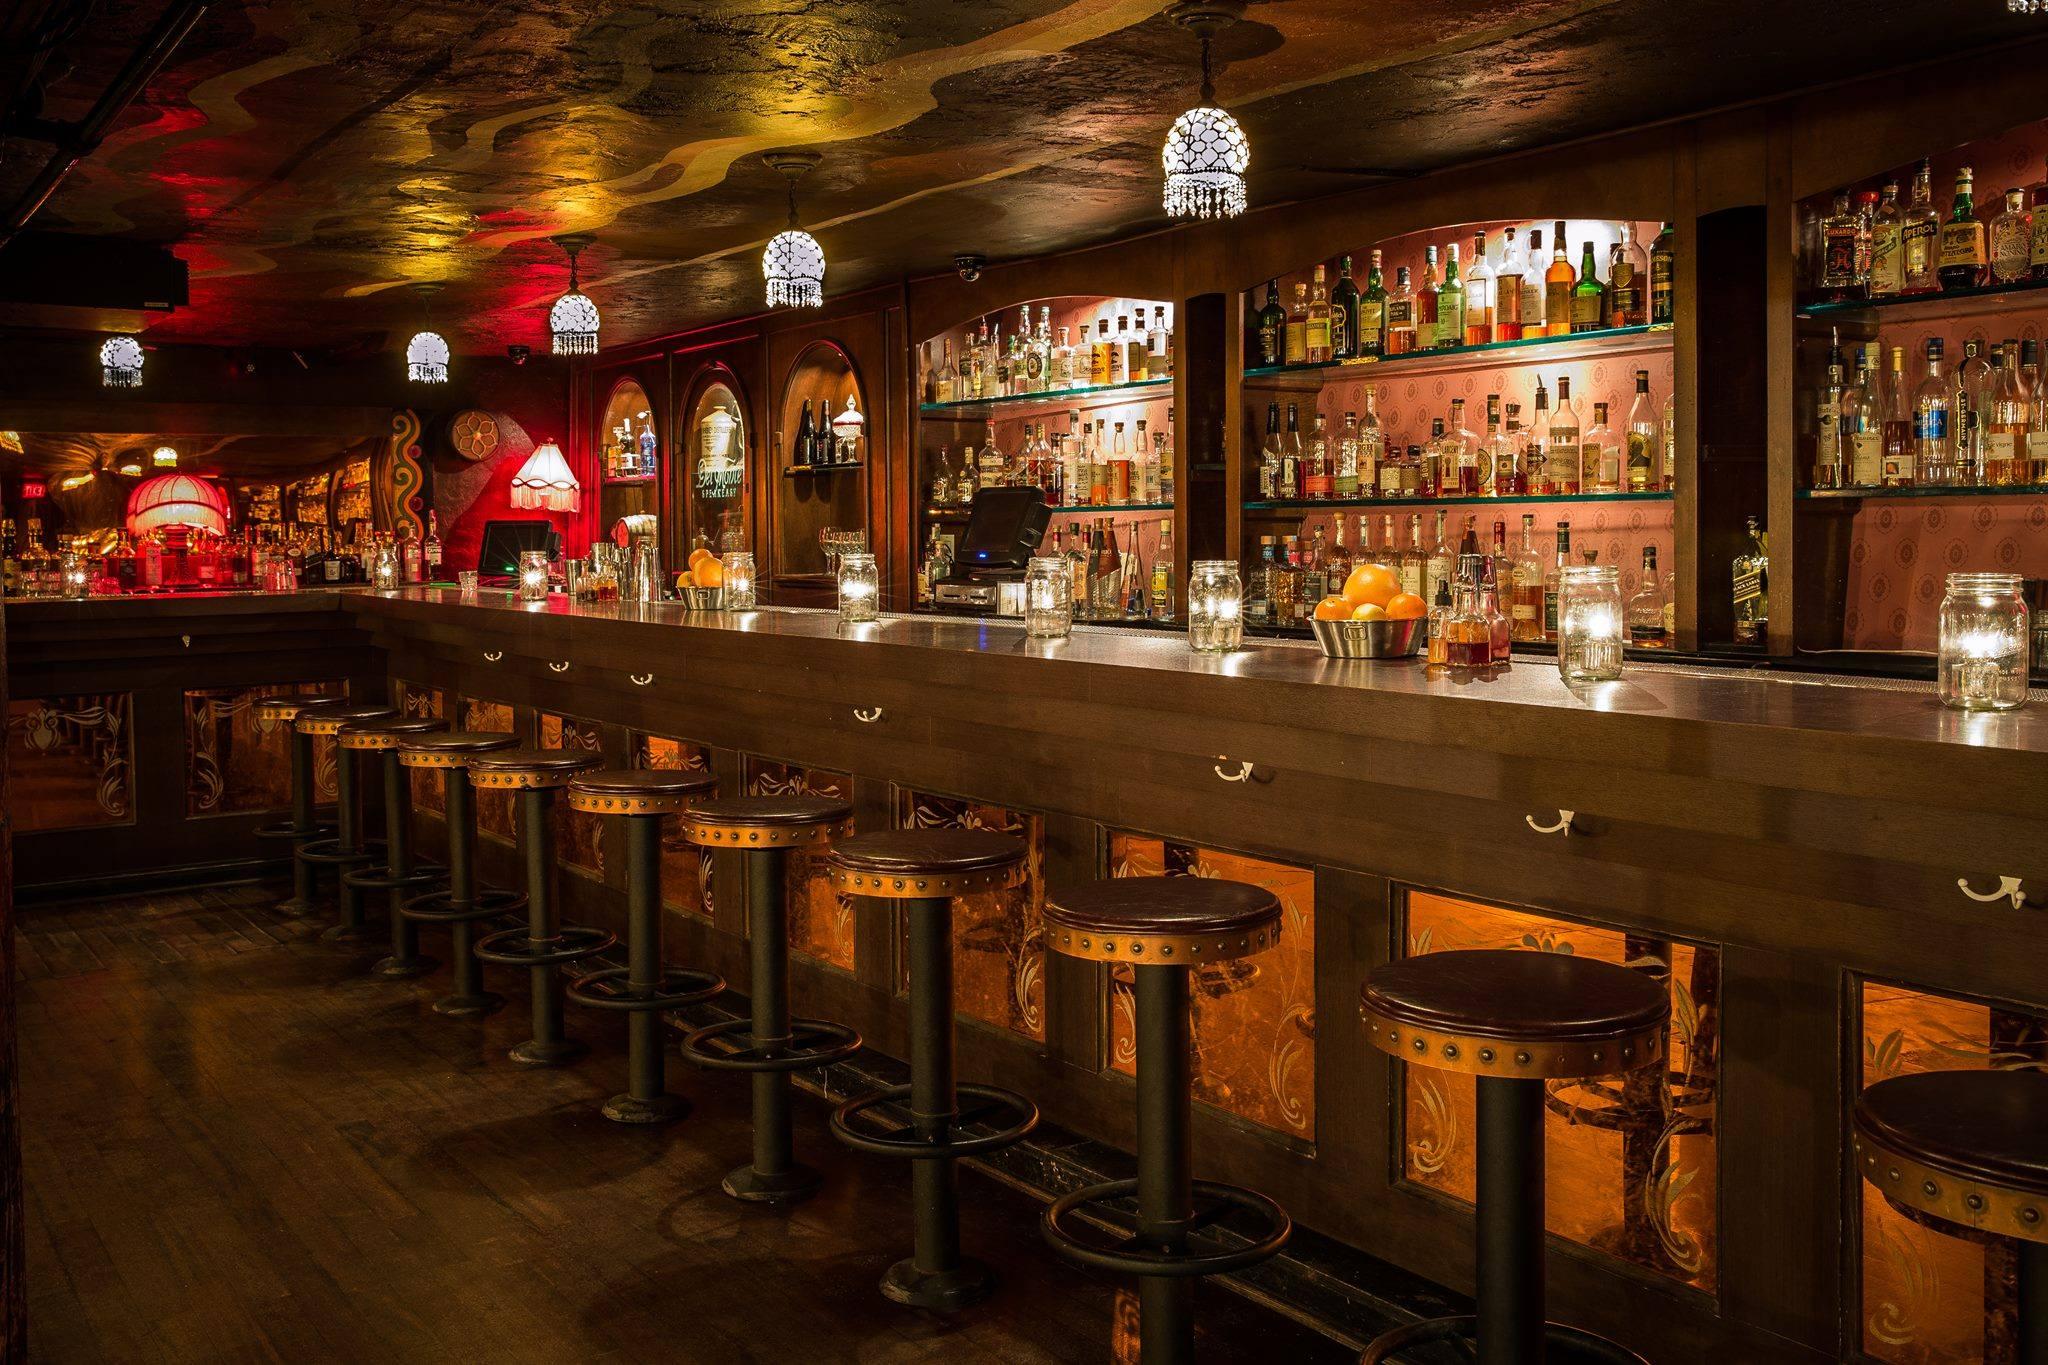 Townhouse & The Del Monte bar in Venice